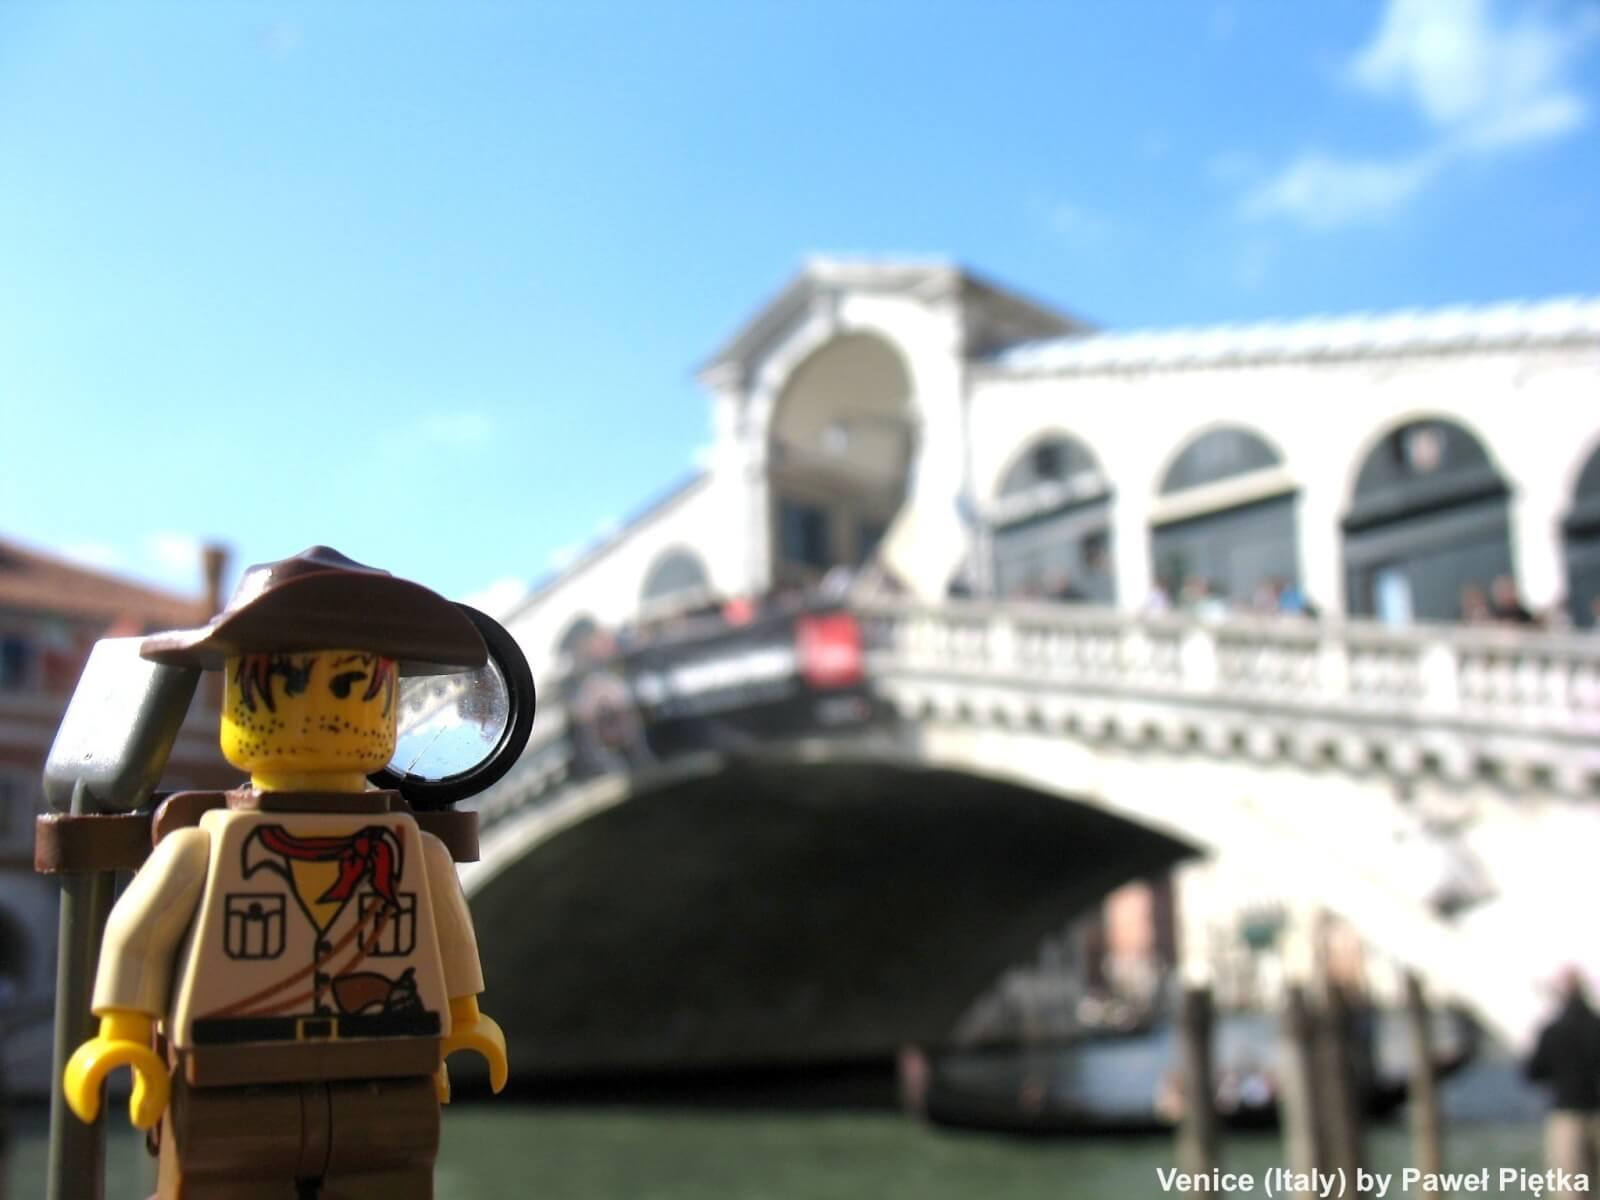 Venice (Italy) - Rialto Bridge